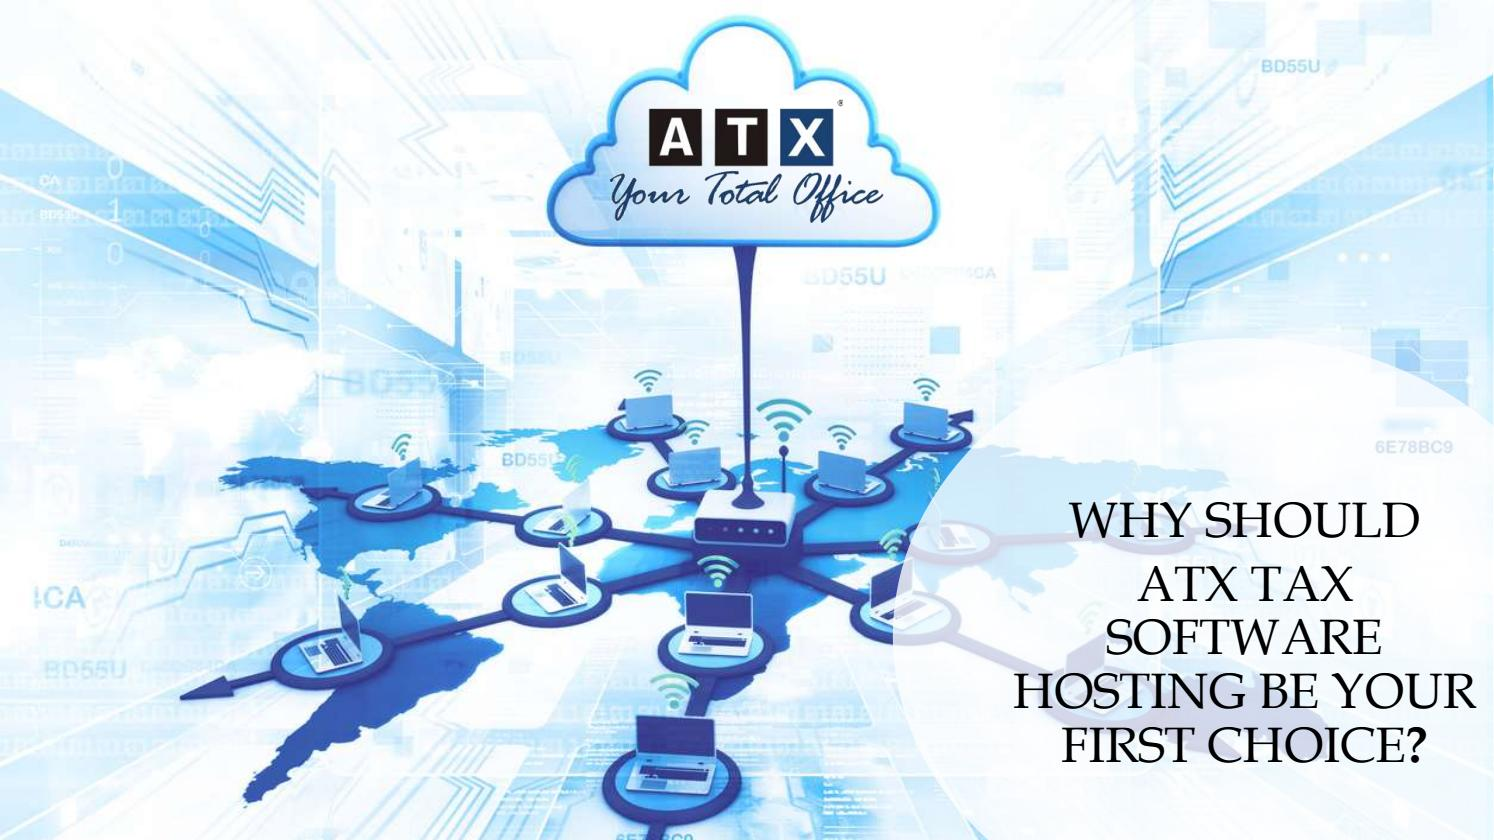 ATX TAX Software Hosting